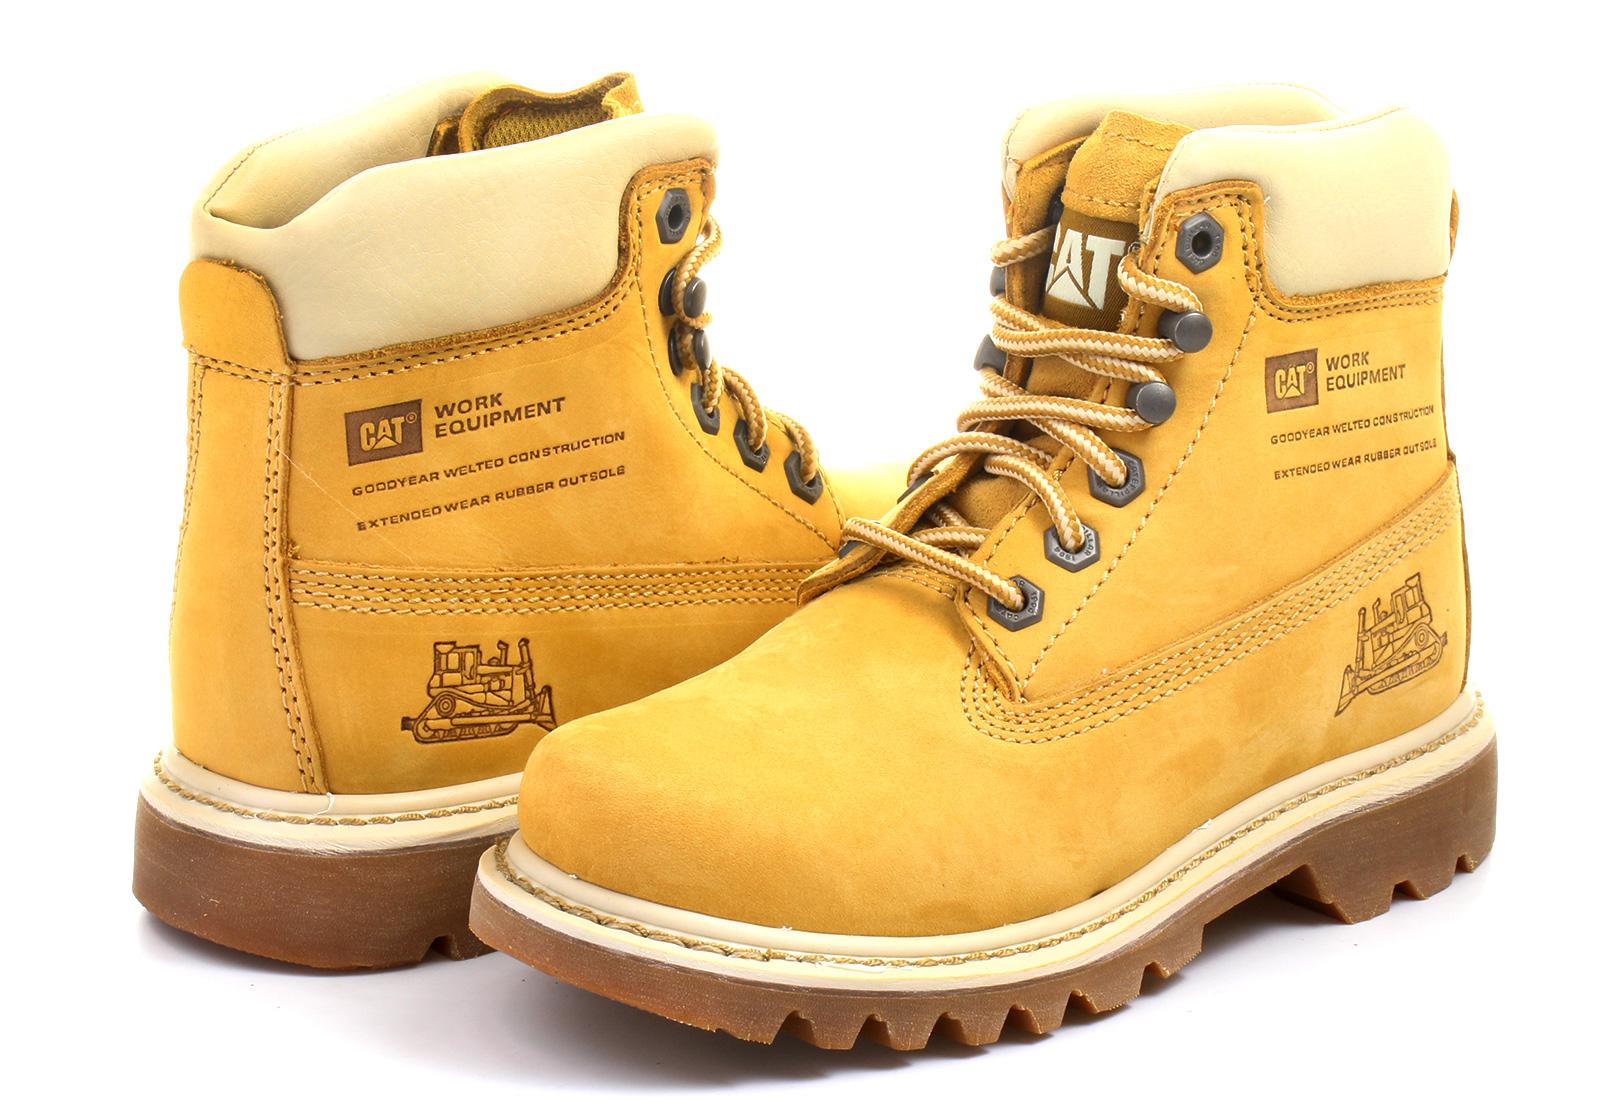 8d4248eb07 Cat Boots - Bruiser - 301762-hon - Online shop for sneakers, shoes ...